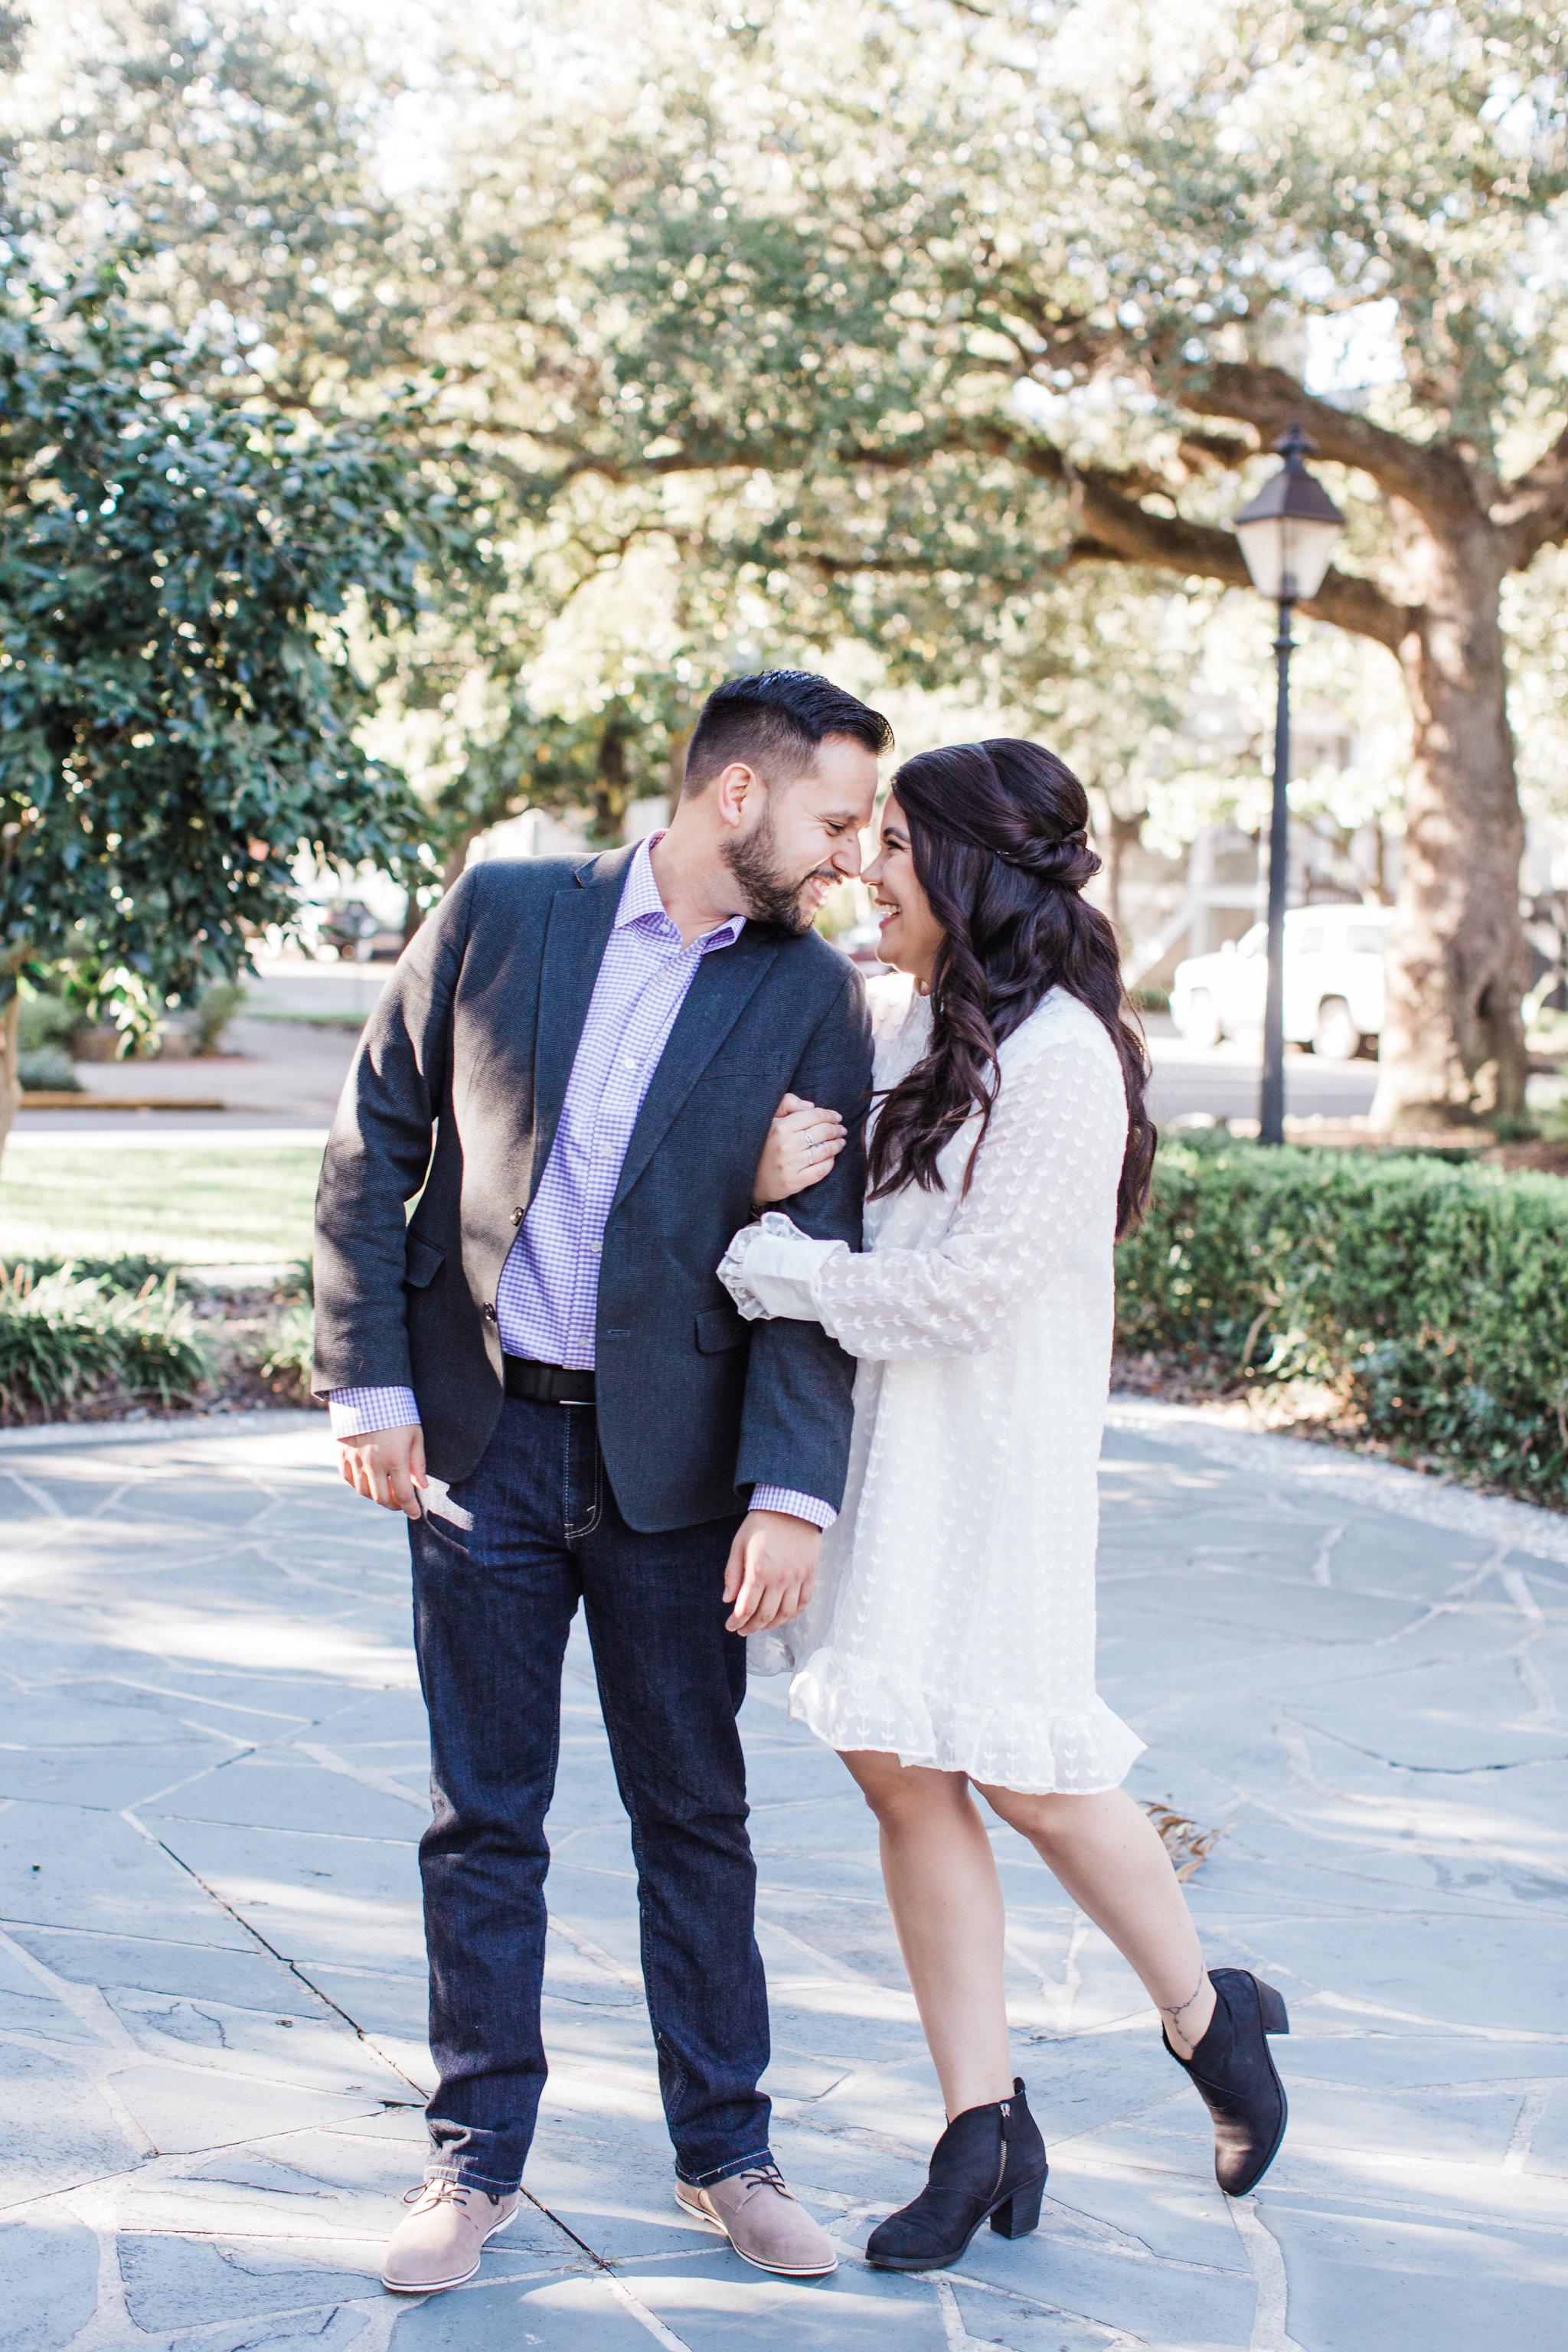 apt-b-photography-Savannah-wedding-photographer-savannah-engagement-photographer-historic-savannah-engagement-savannah-weddings-hilton-head-wedding-photographer-hilton-head-engagement-7.jpg